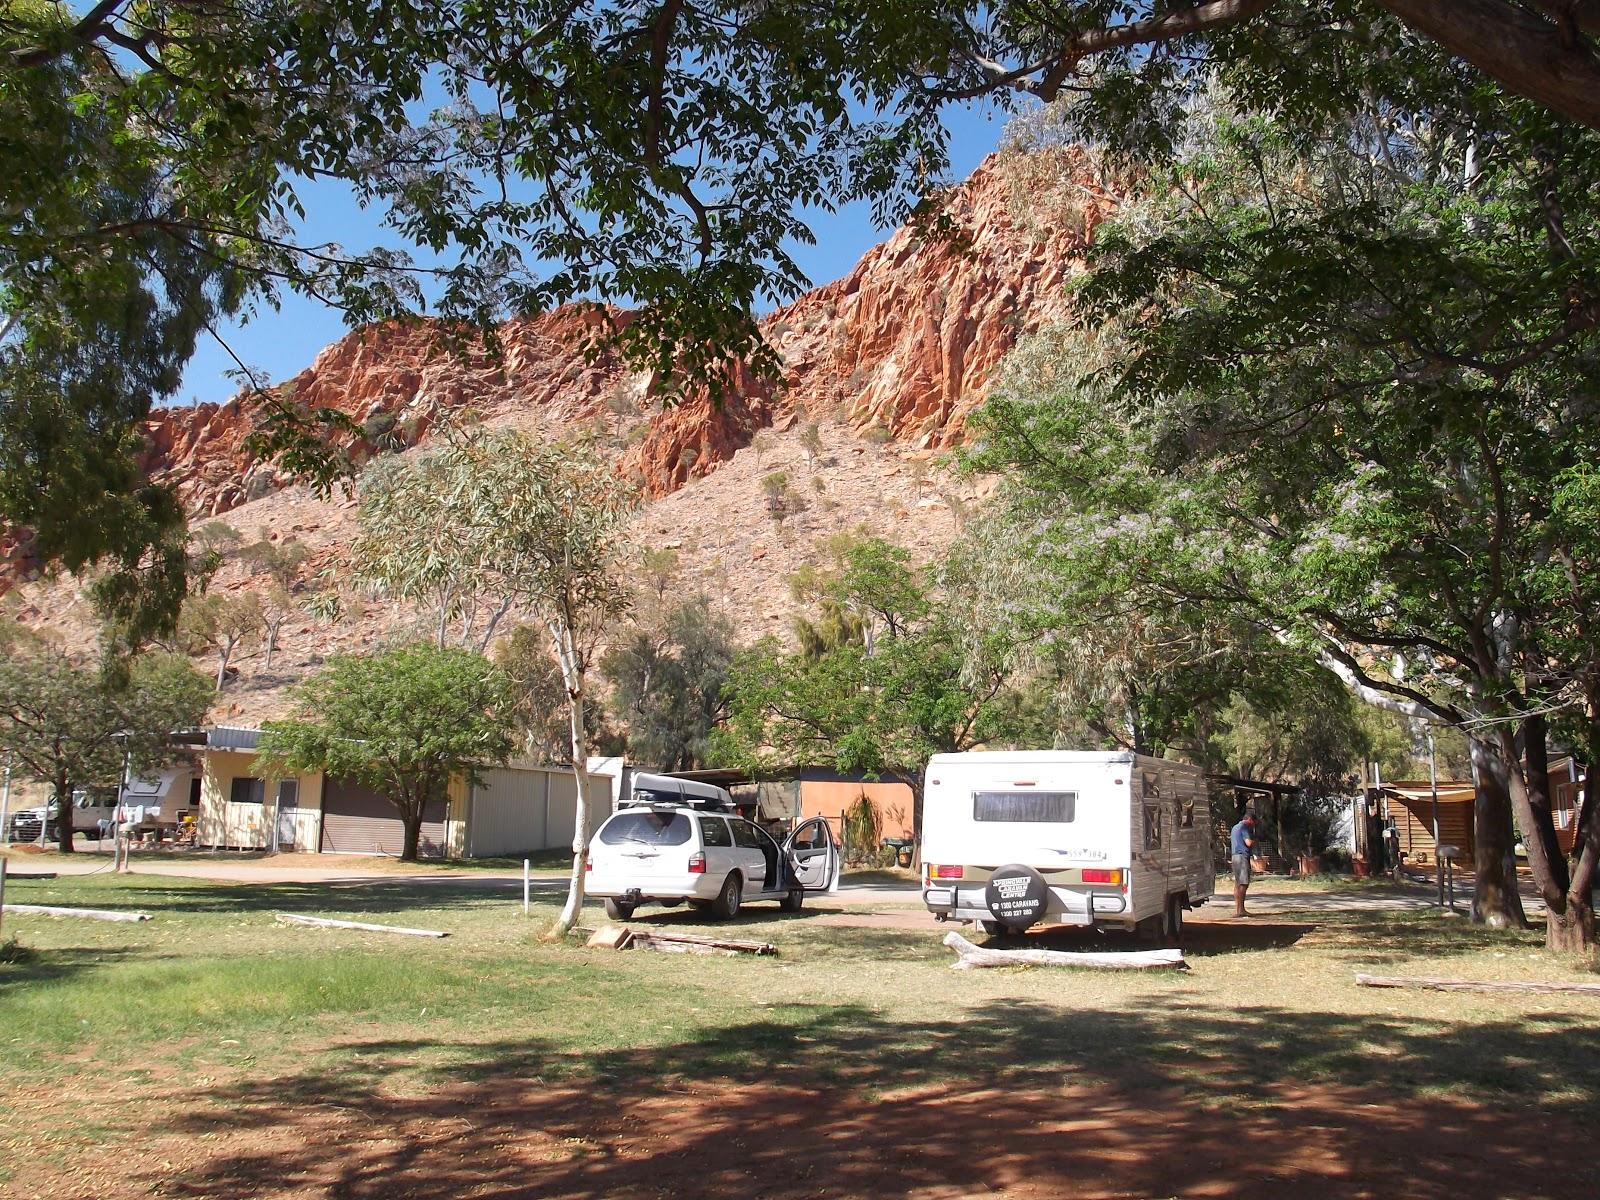 Australian Adventure Alice Springs To Ayers Rock 18 9 12 28 9 12